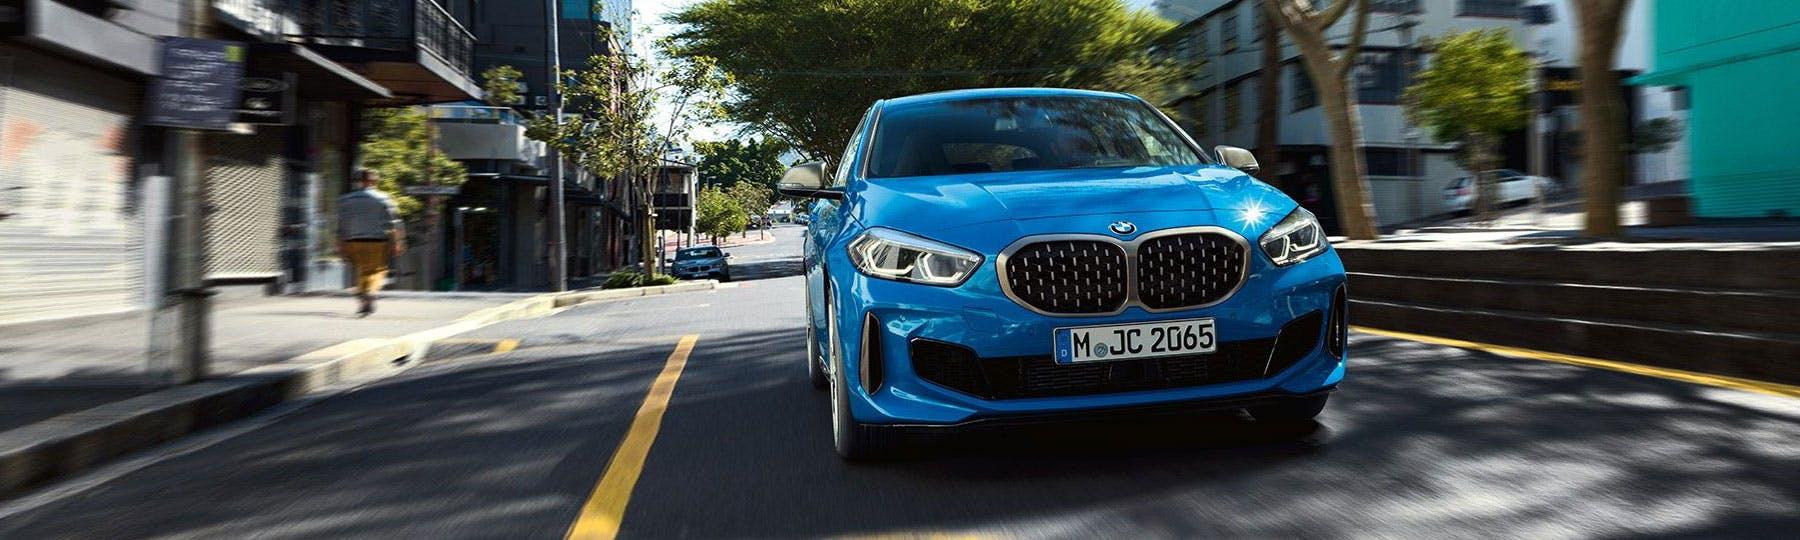 BMW 1 Series Sports Hatch